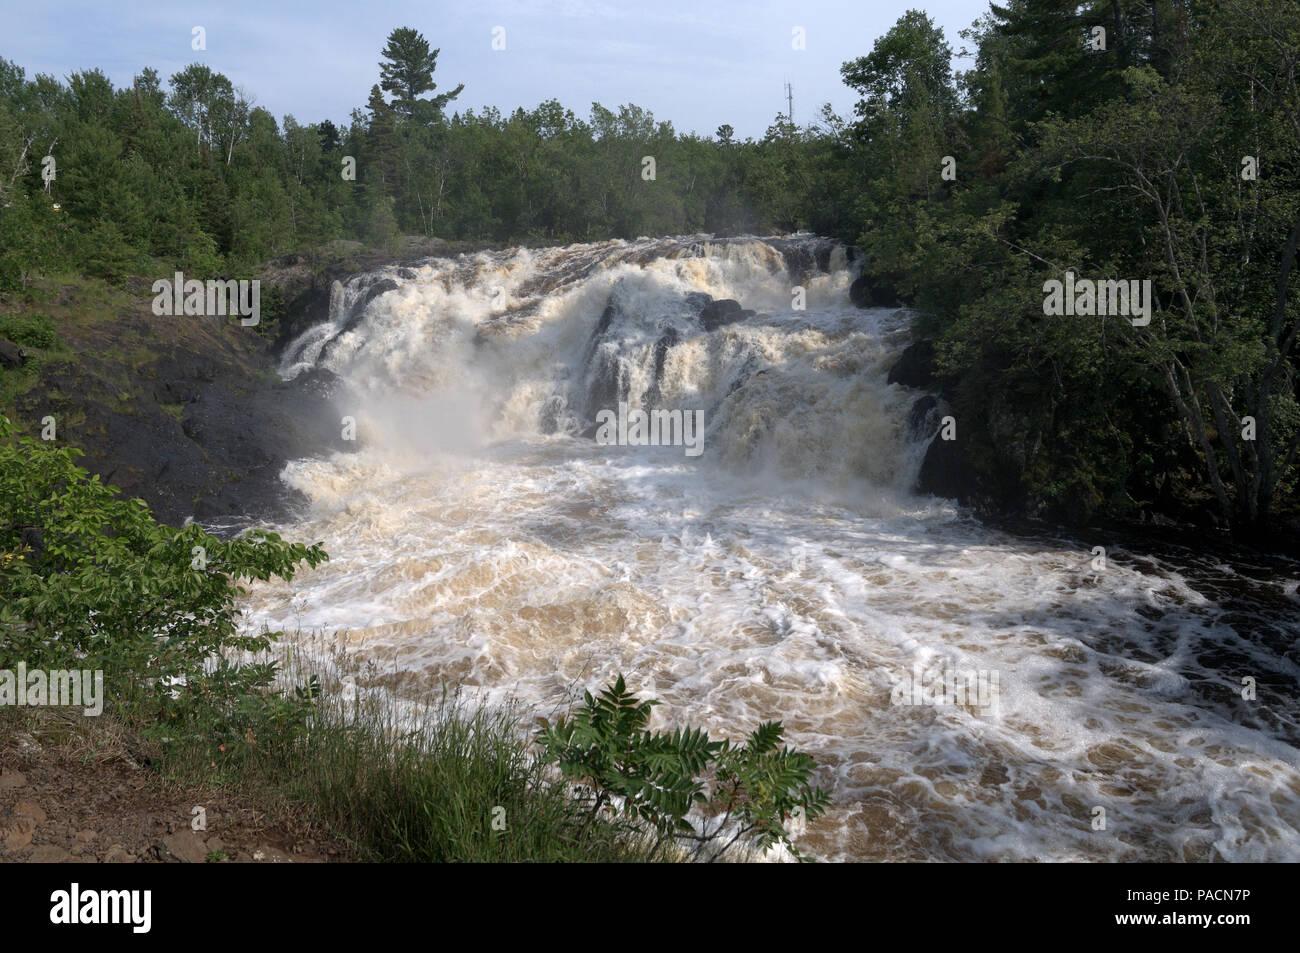 Kawishiwi Falls près d'Ely, Minnesota, USA Banque D'Images